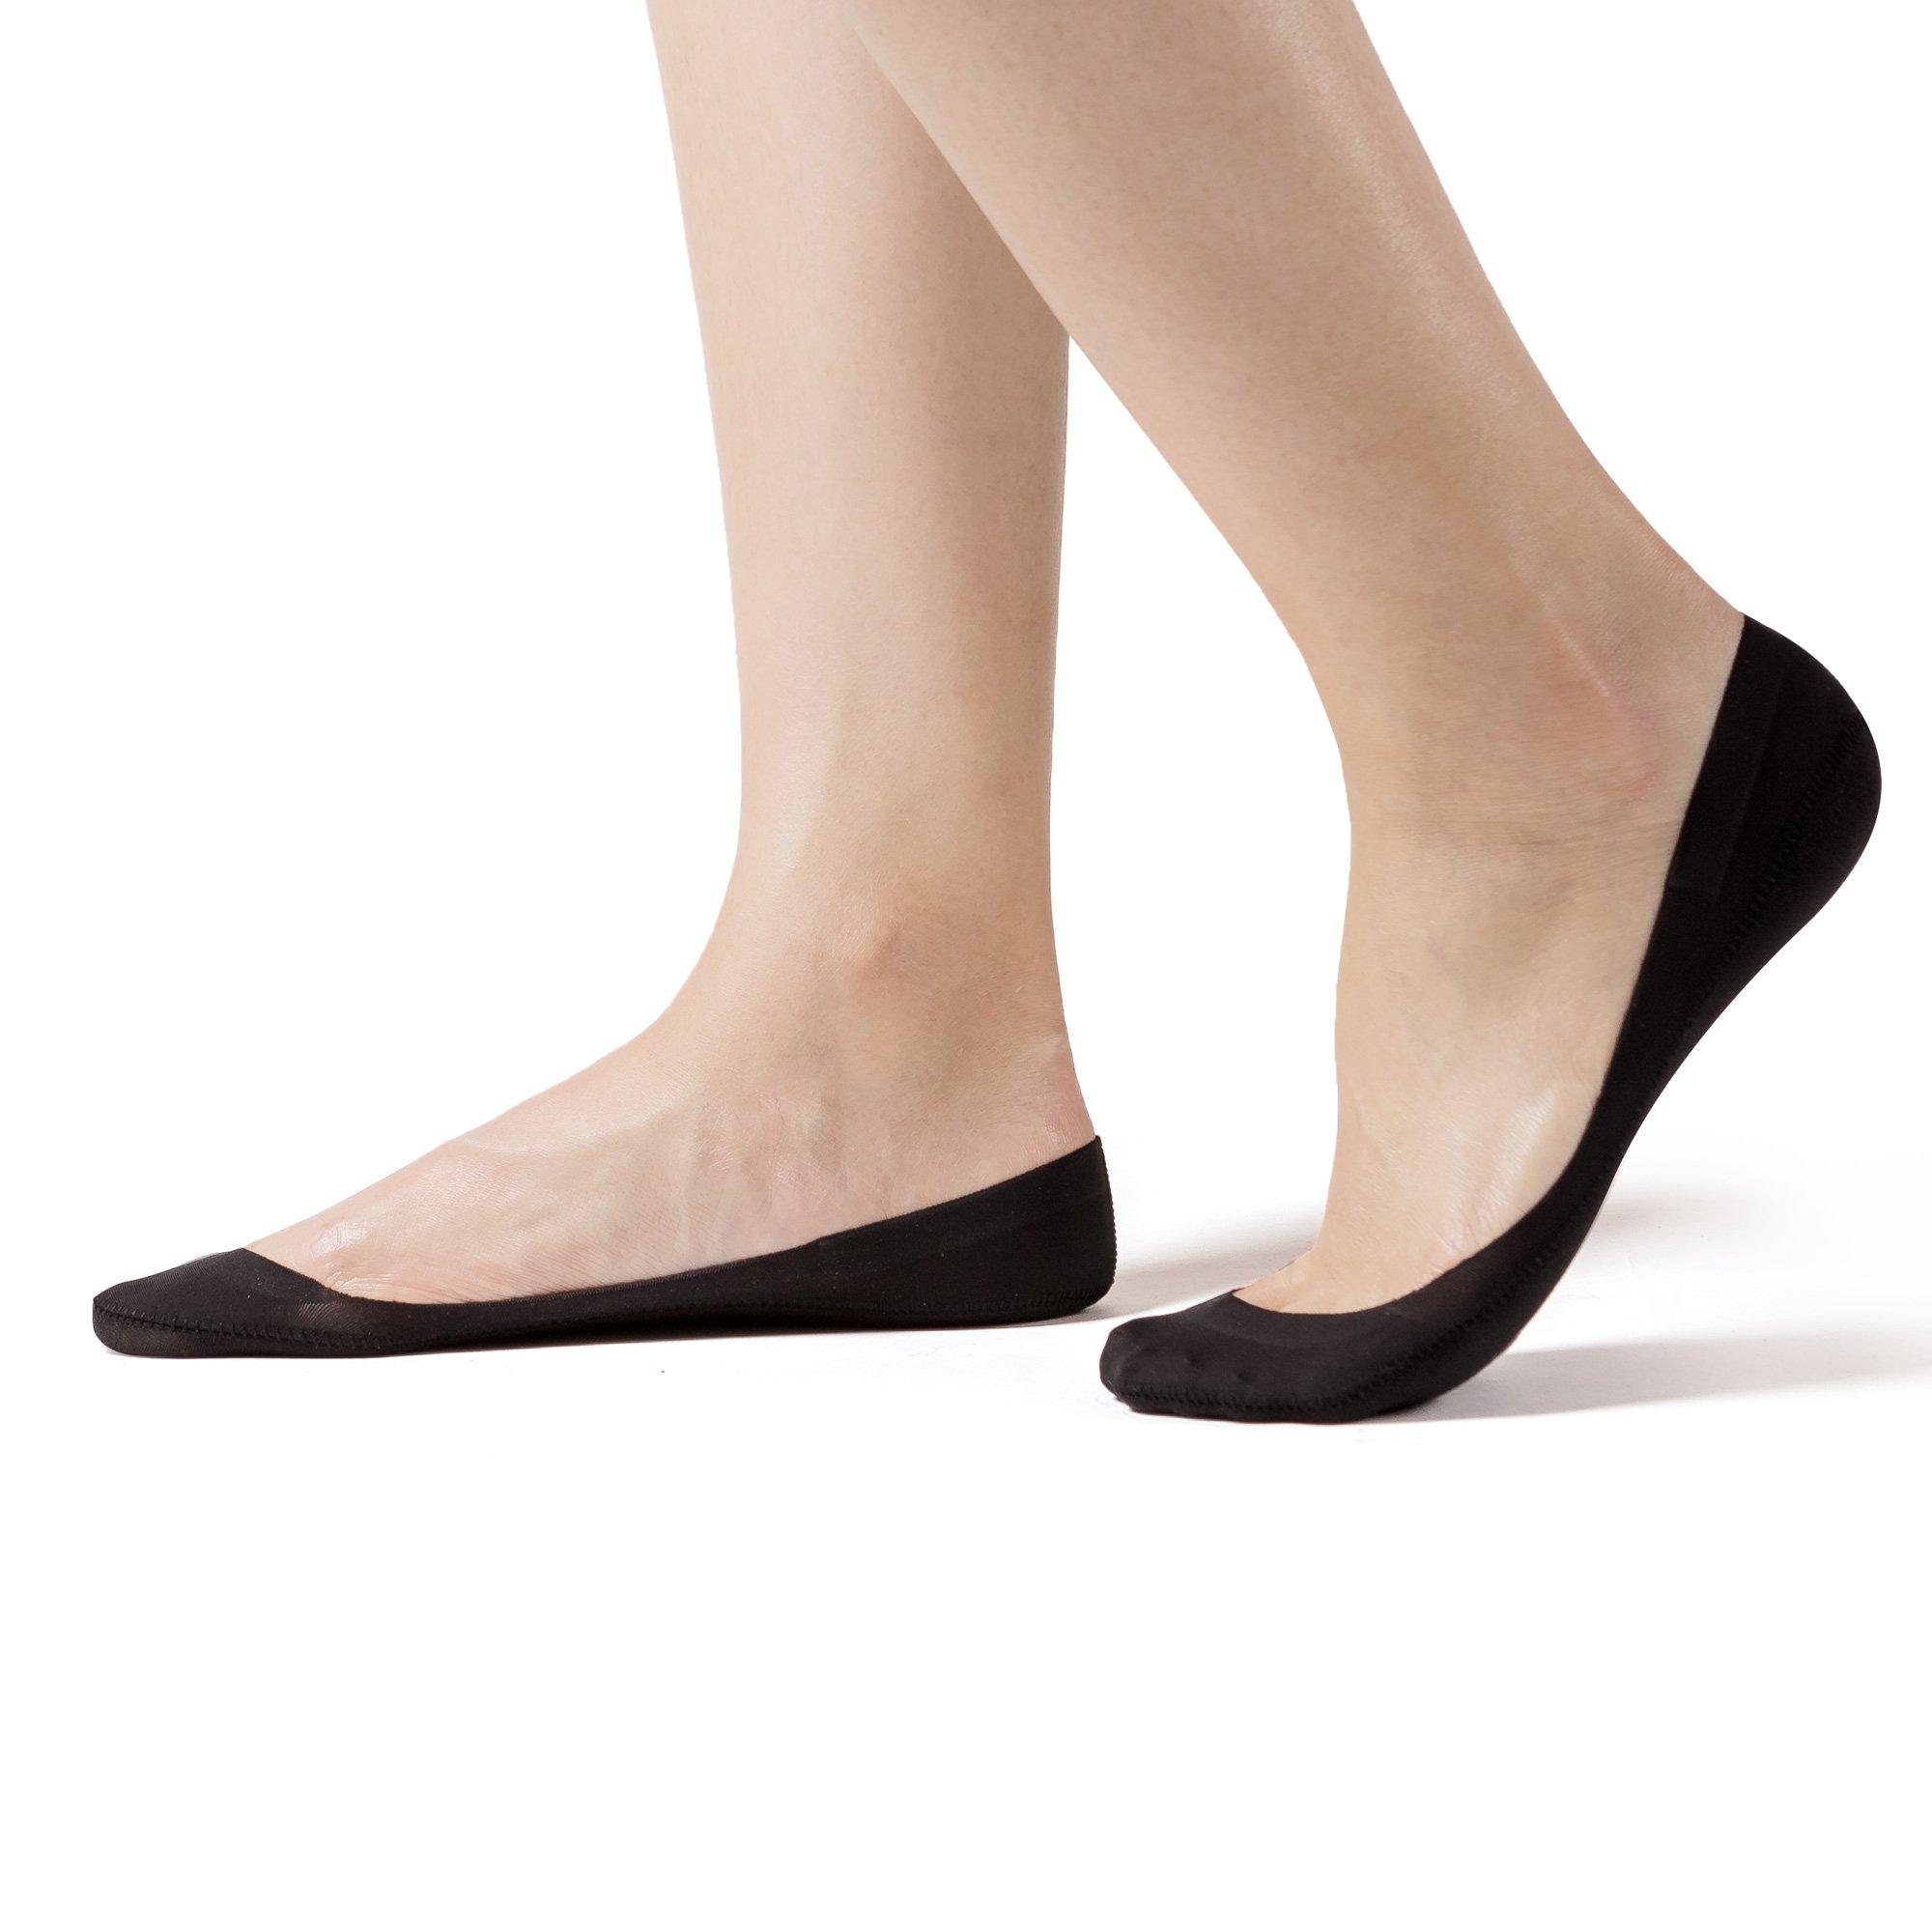 SHEEC SoleHugger Secret 2.0 - No Show Non Slip Women's Sock - Black Small 4 Pairs